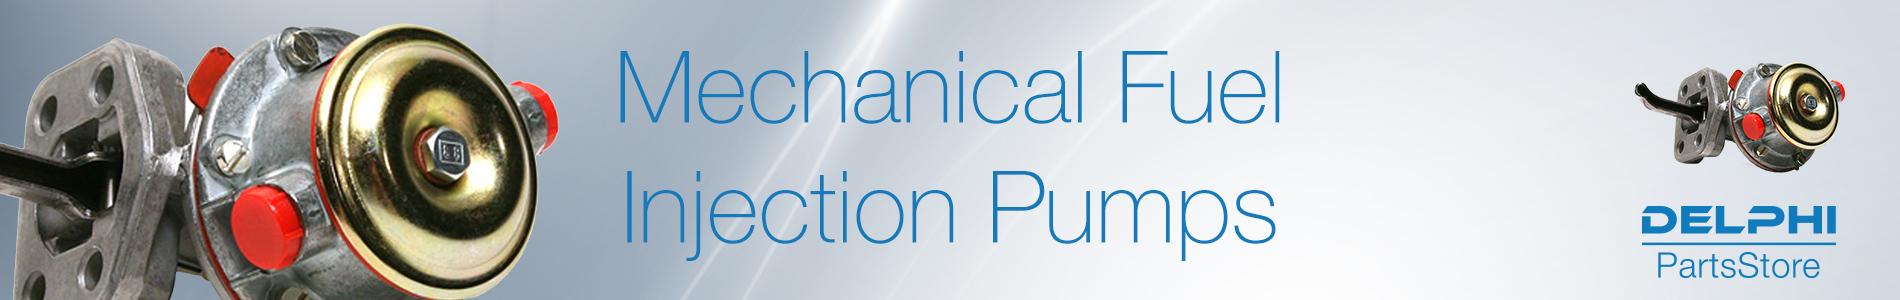 Mechanical Fuel Injection Pumps